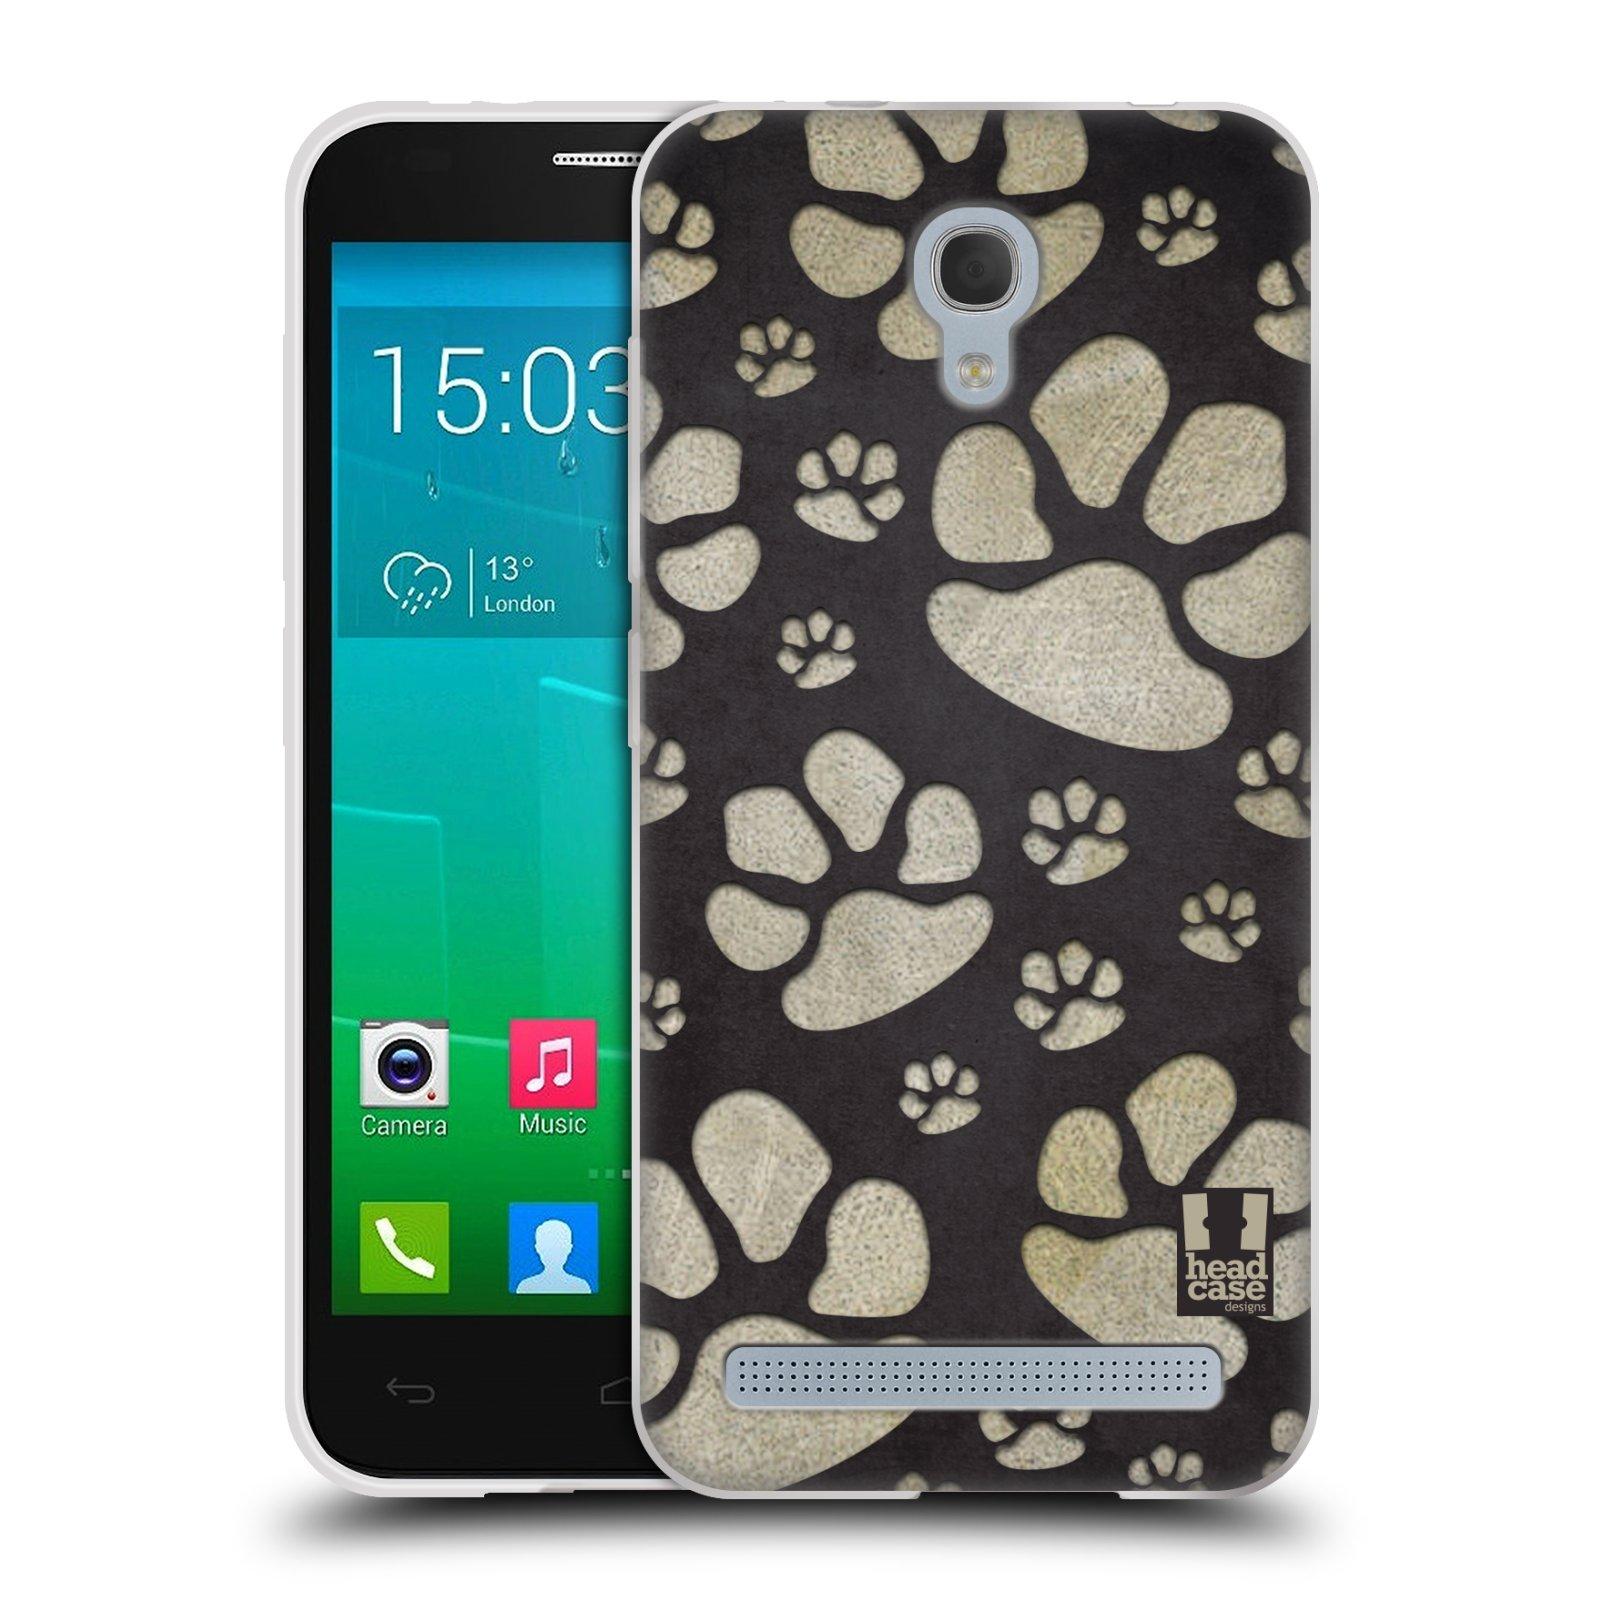 Silikonové pouzdro na mobil Alcatel One Touch Idol 2 Mini S 6036Y HEAD CASE TLAPKY ŠEDÉ (Silikonový kryt či obal na mobilní telefon Alcatel Idol 2 Mini S OT-6036Y)